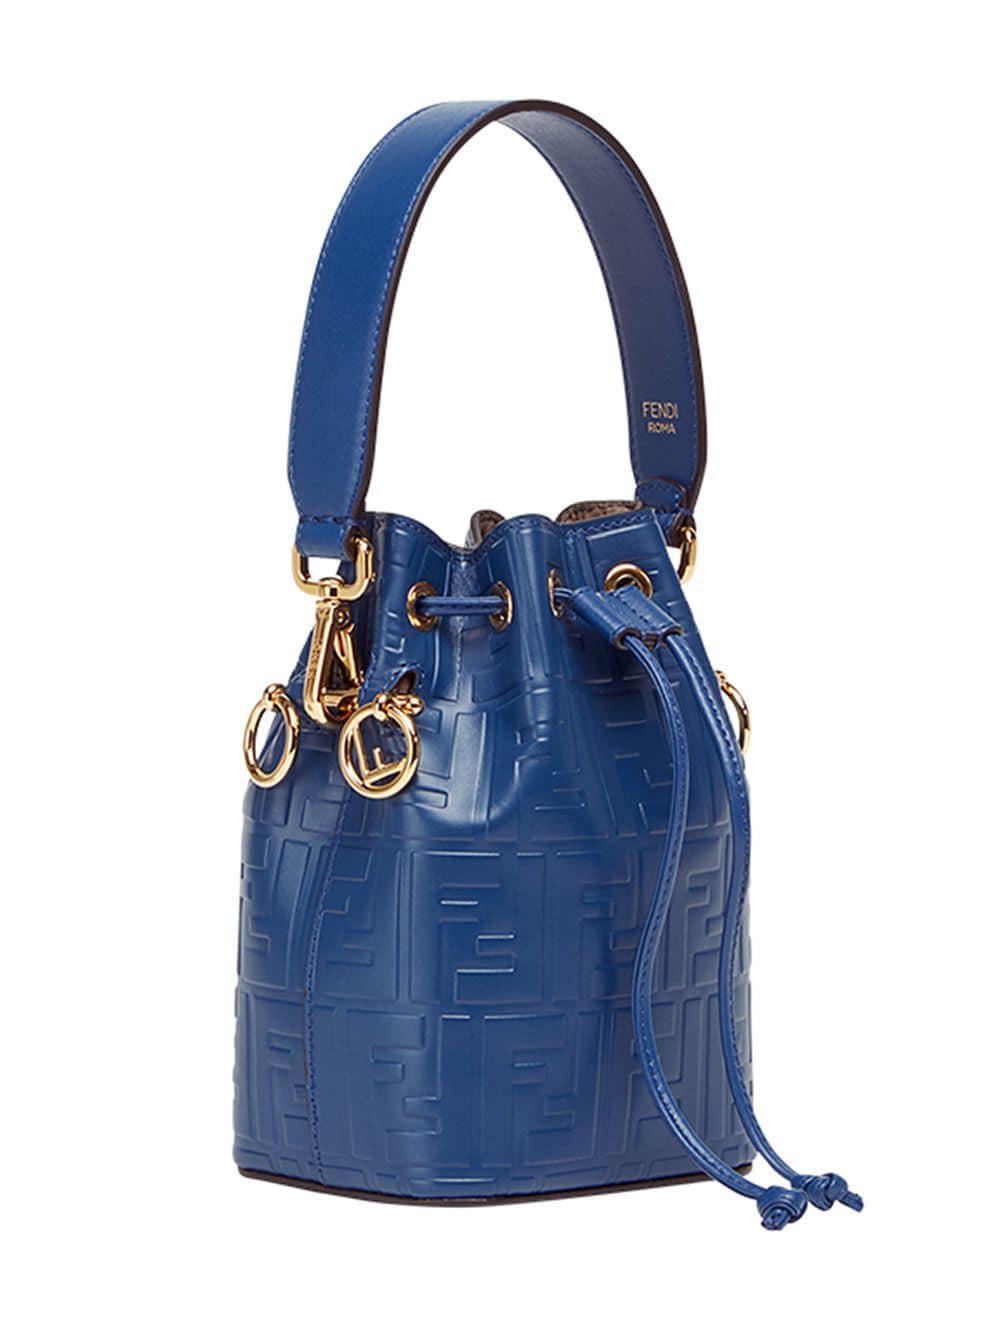 d428c3430000 Lyst - Fendi Mini Mon Tresor Embossed Bucket Bag in Blue - Save 6%